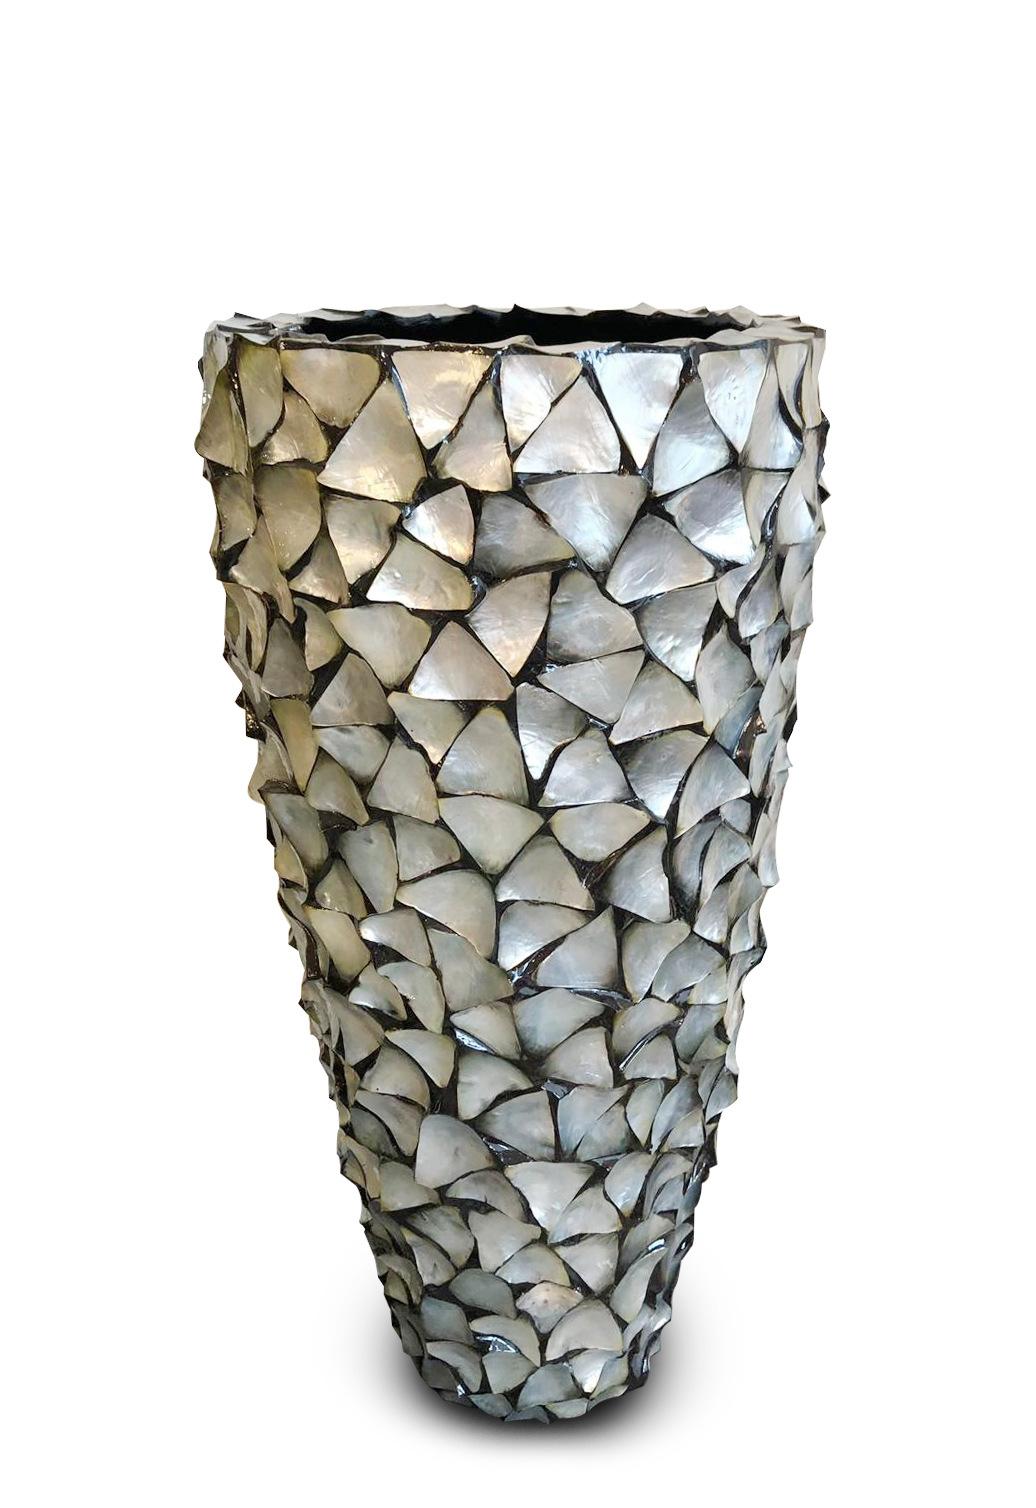 1544796054-accessoires-deko-vase-perla-iii.jpg